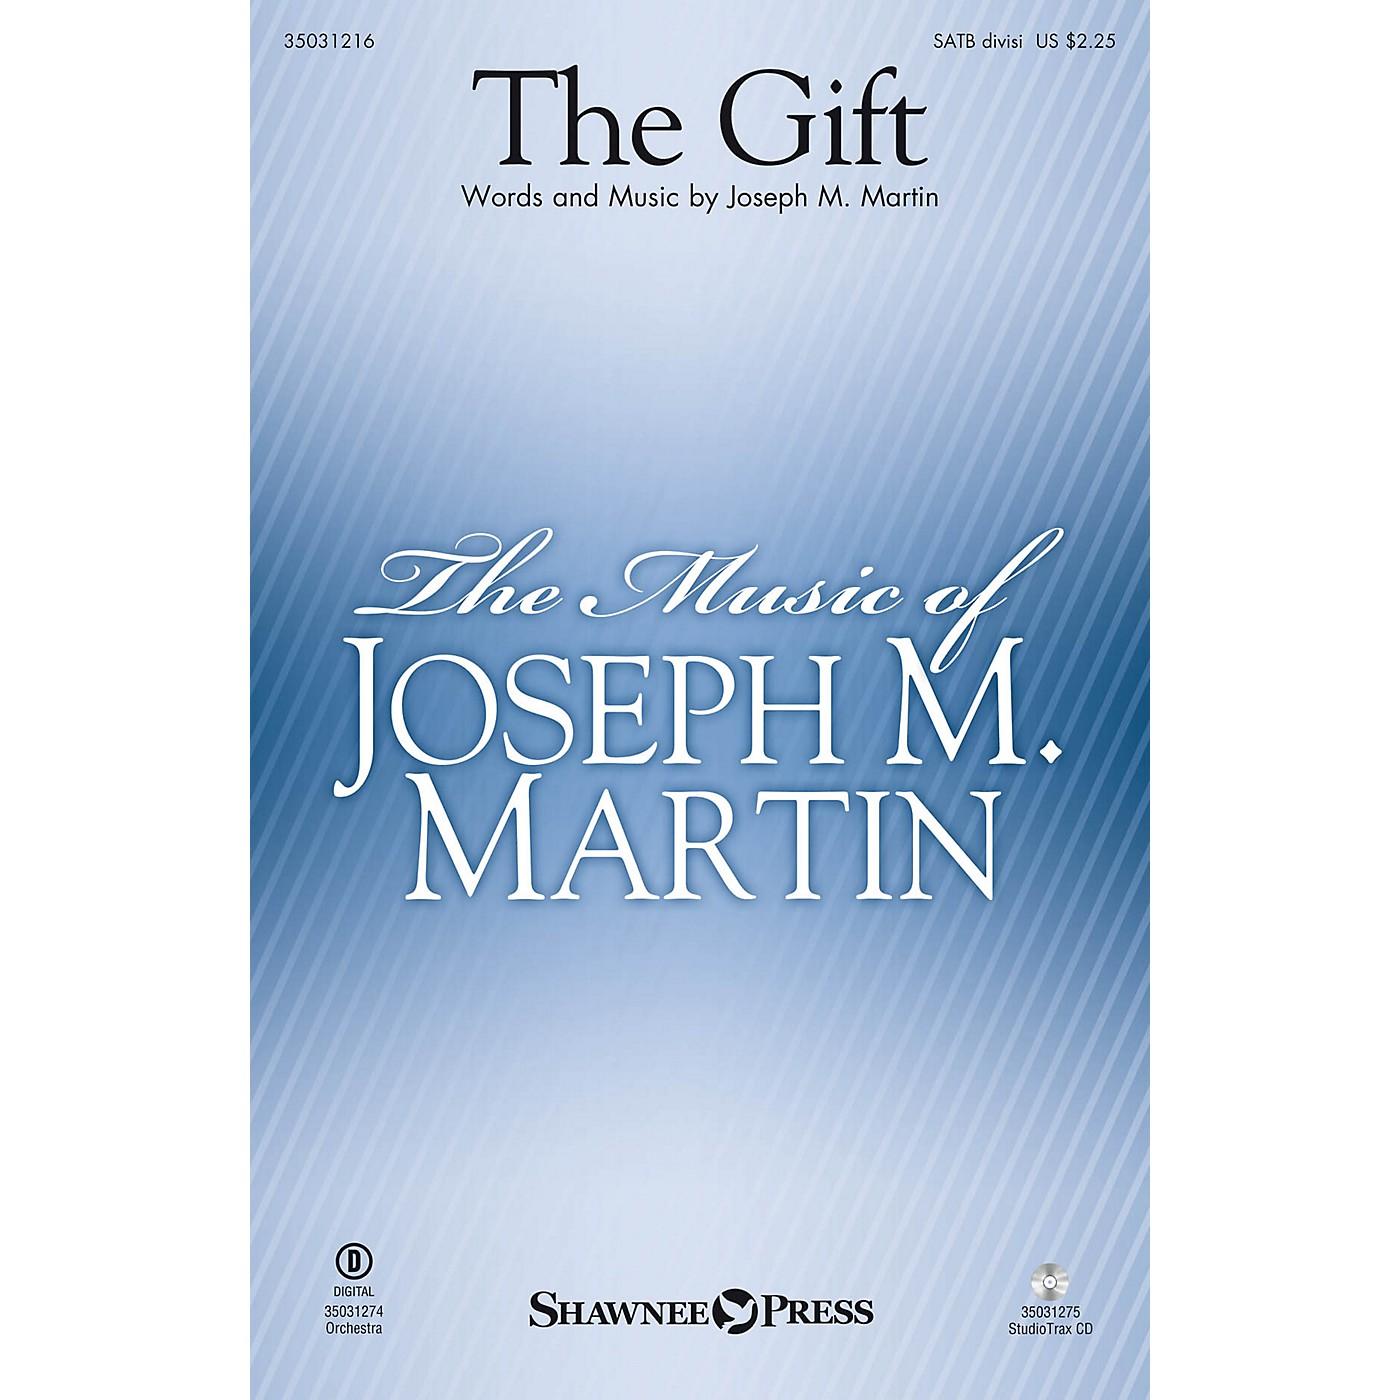 Shawnee Press The Gift SATB Divisi composed by Joseph M. Martin thumbnail